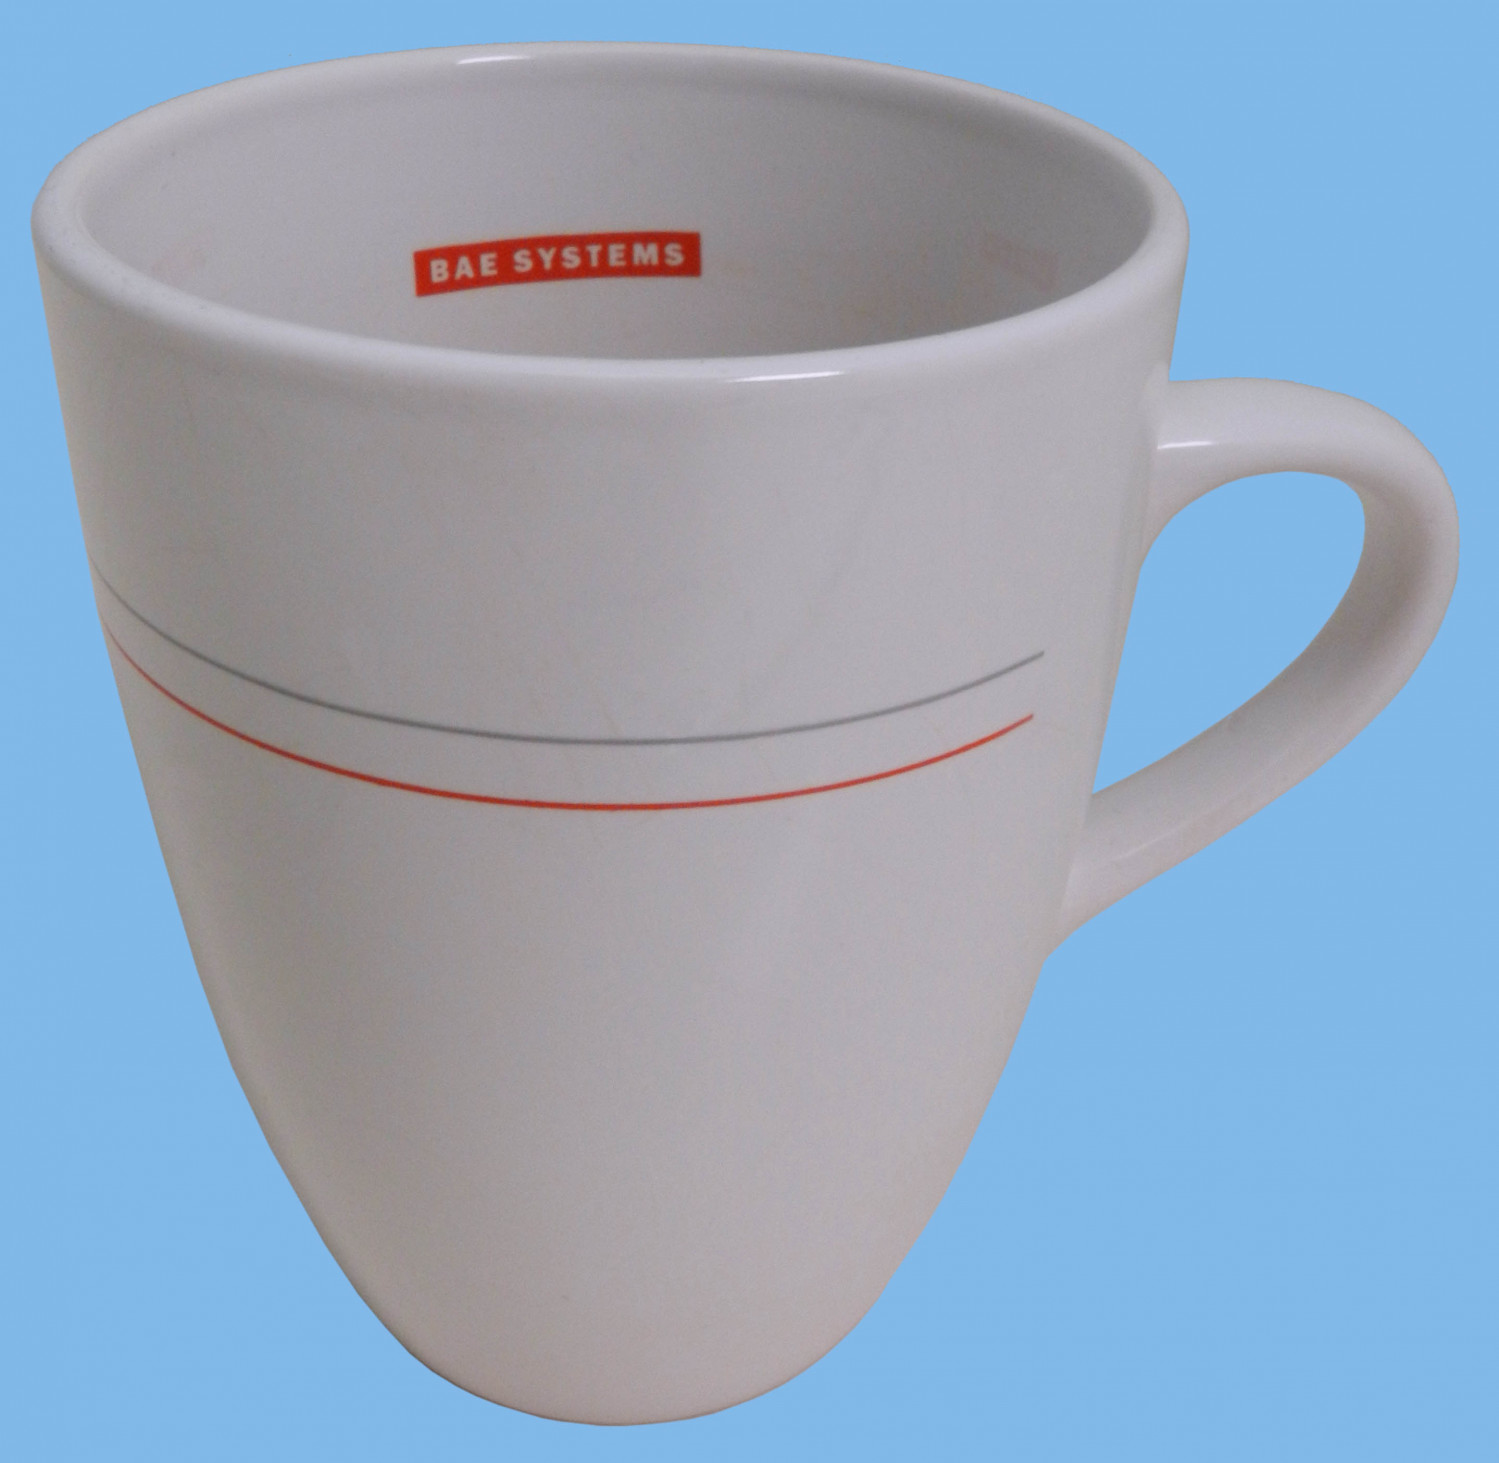 BAe Systems Coffee Mugs